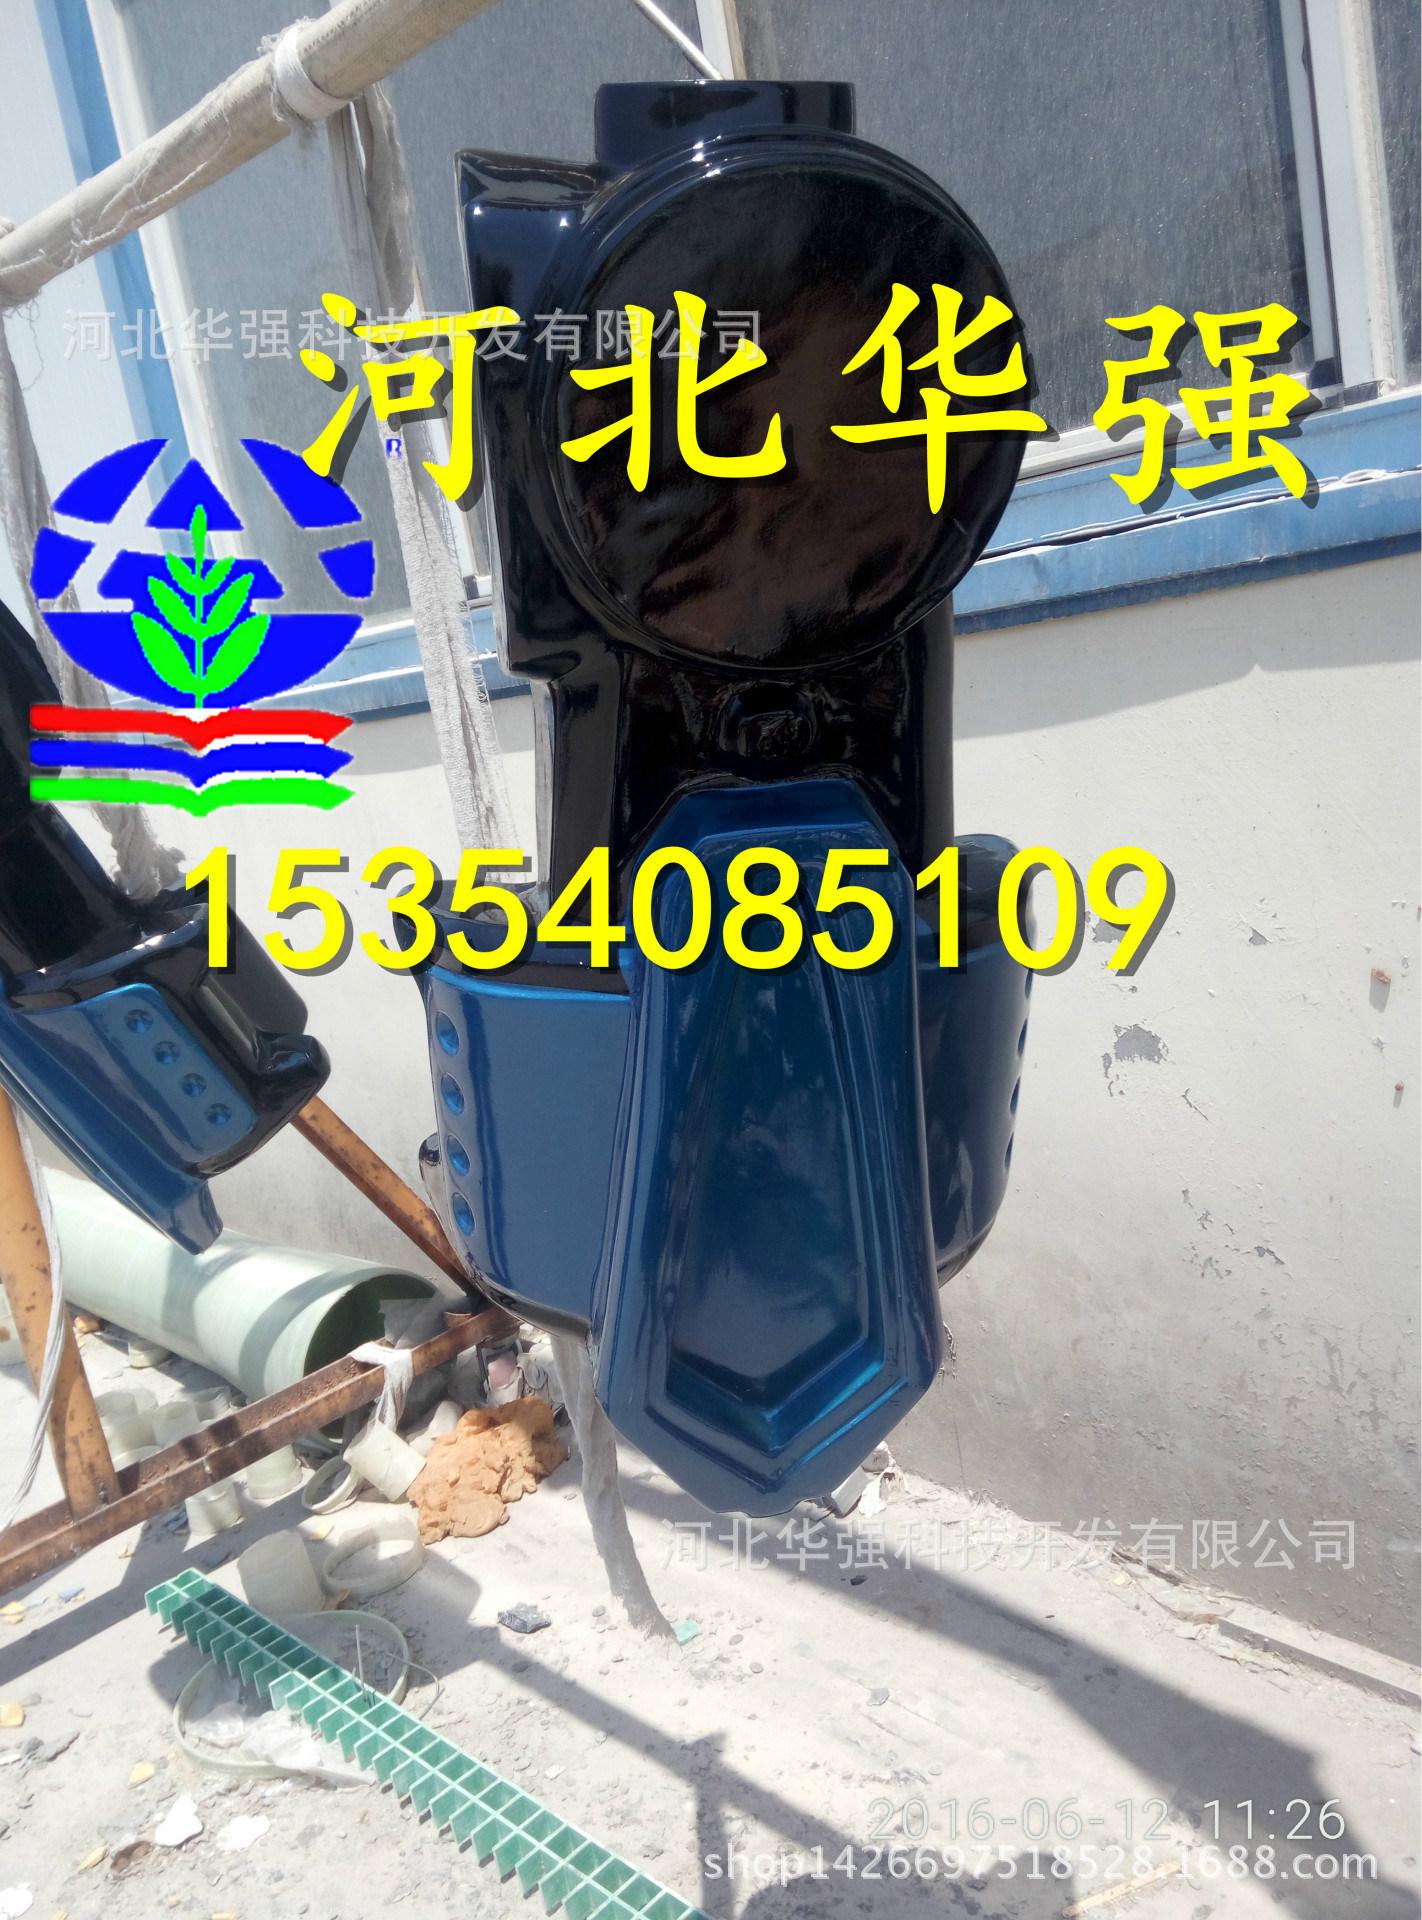 P60612-112600